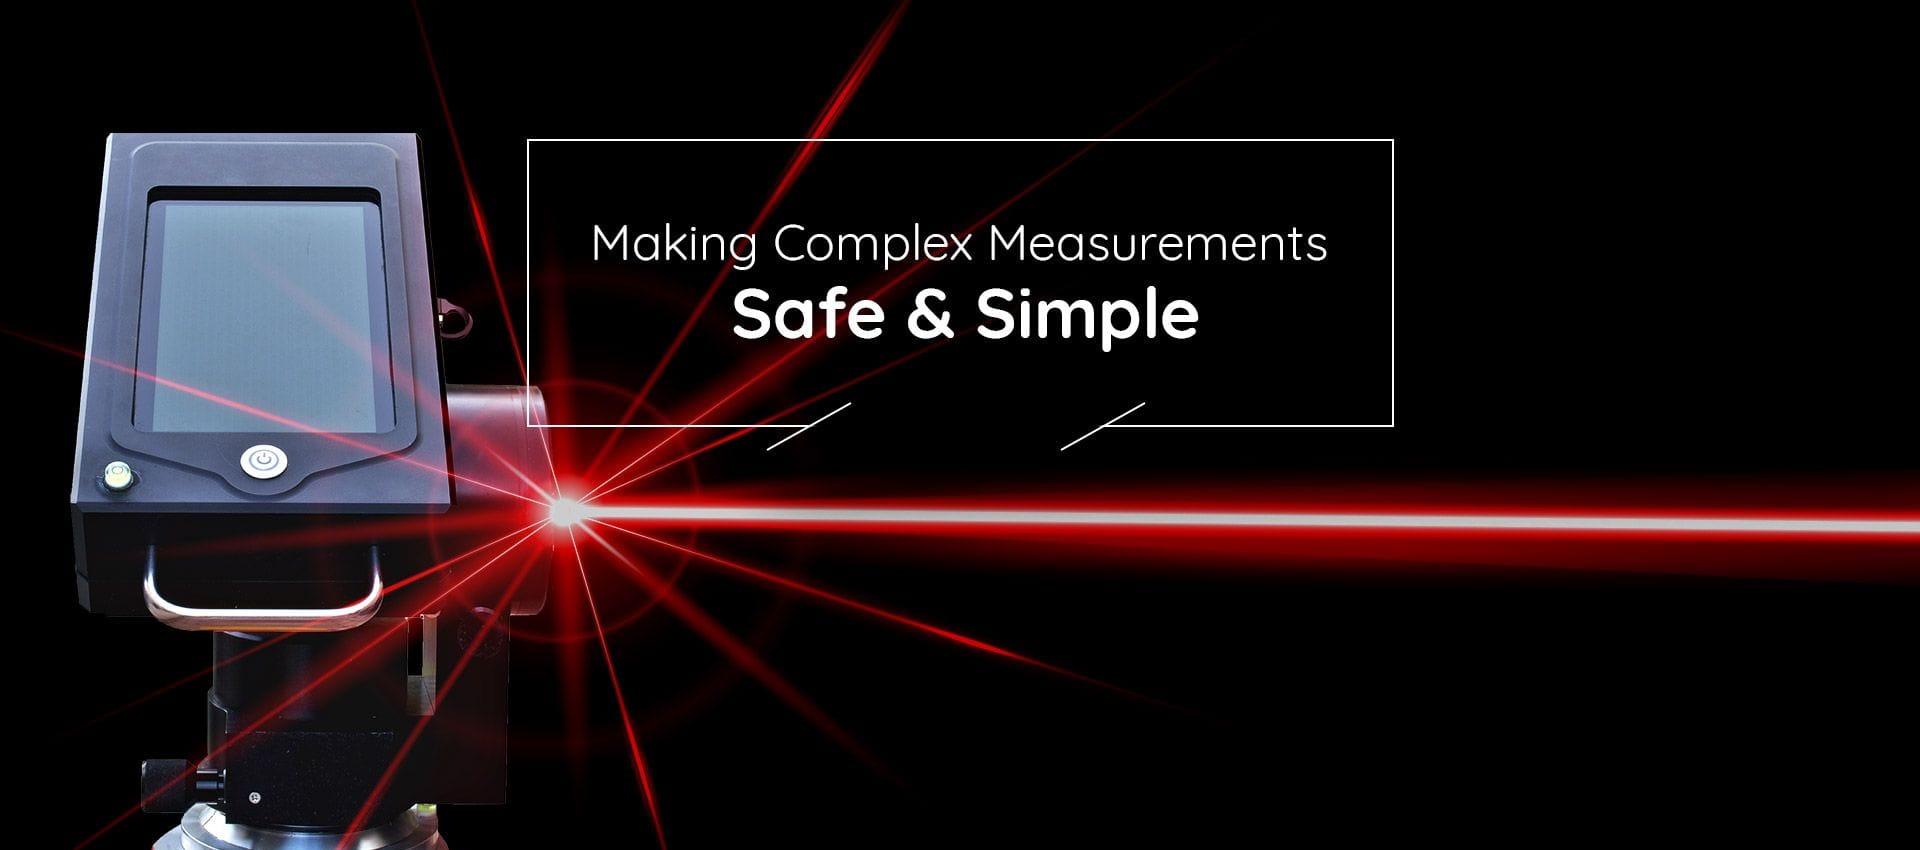 Making Complex Laser Measurements Safe & Simple | ApoSys Technologies Inc.